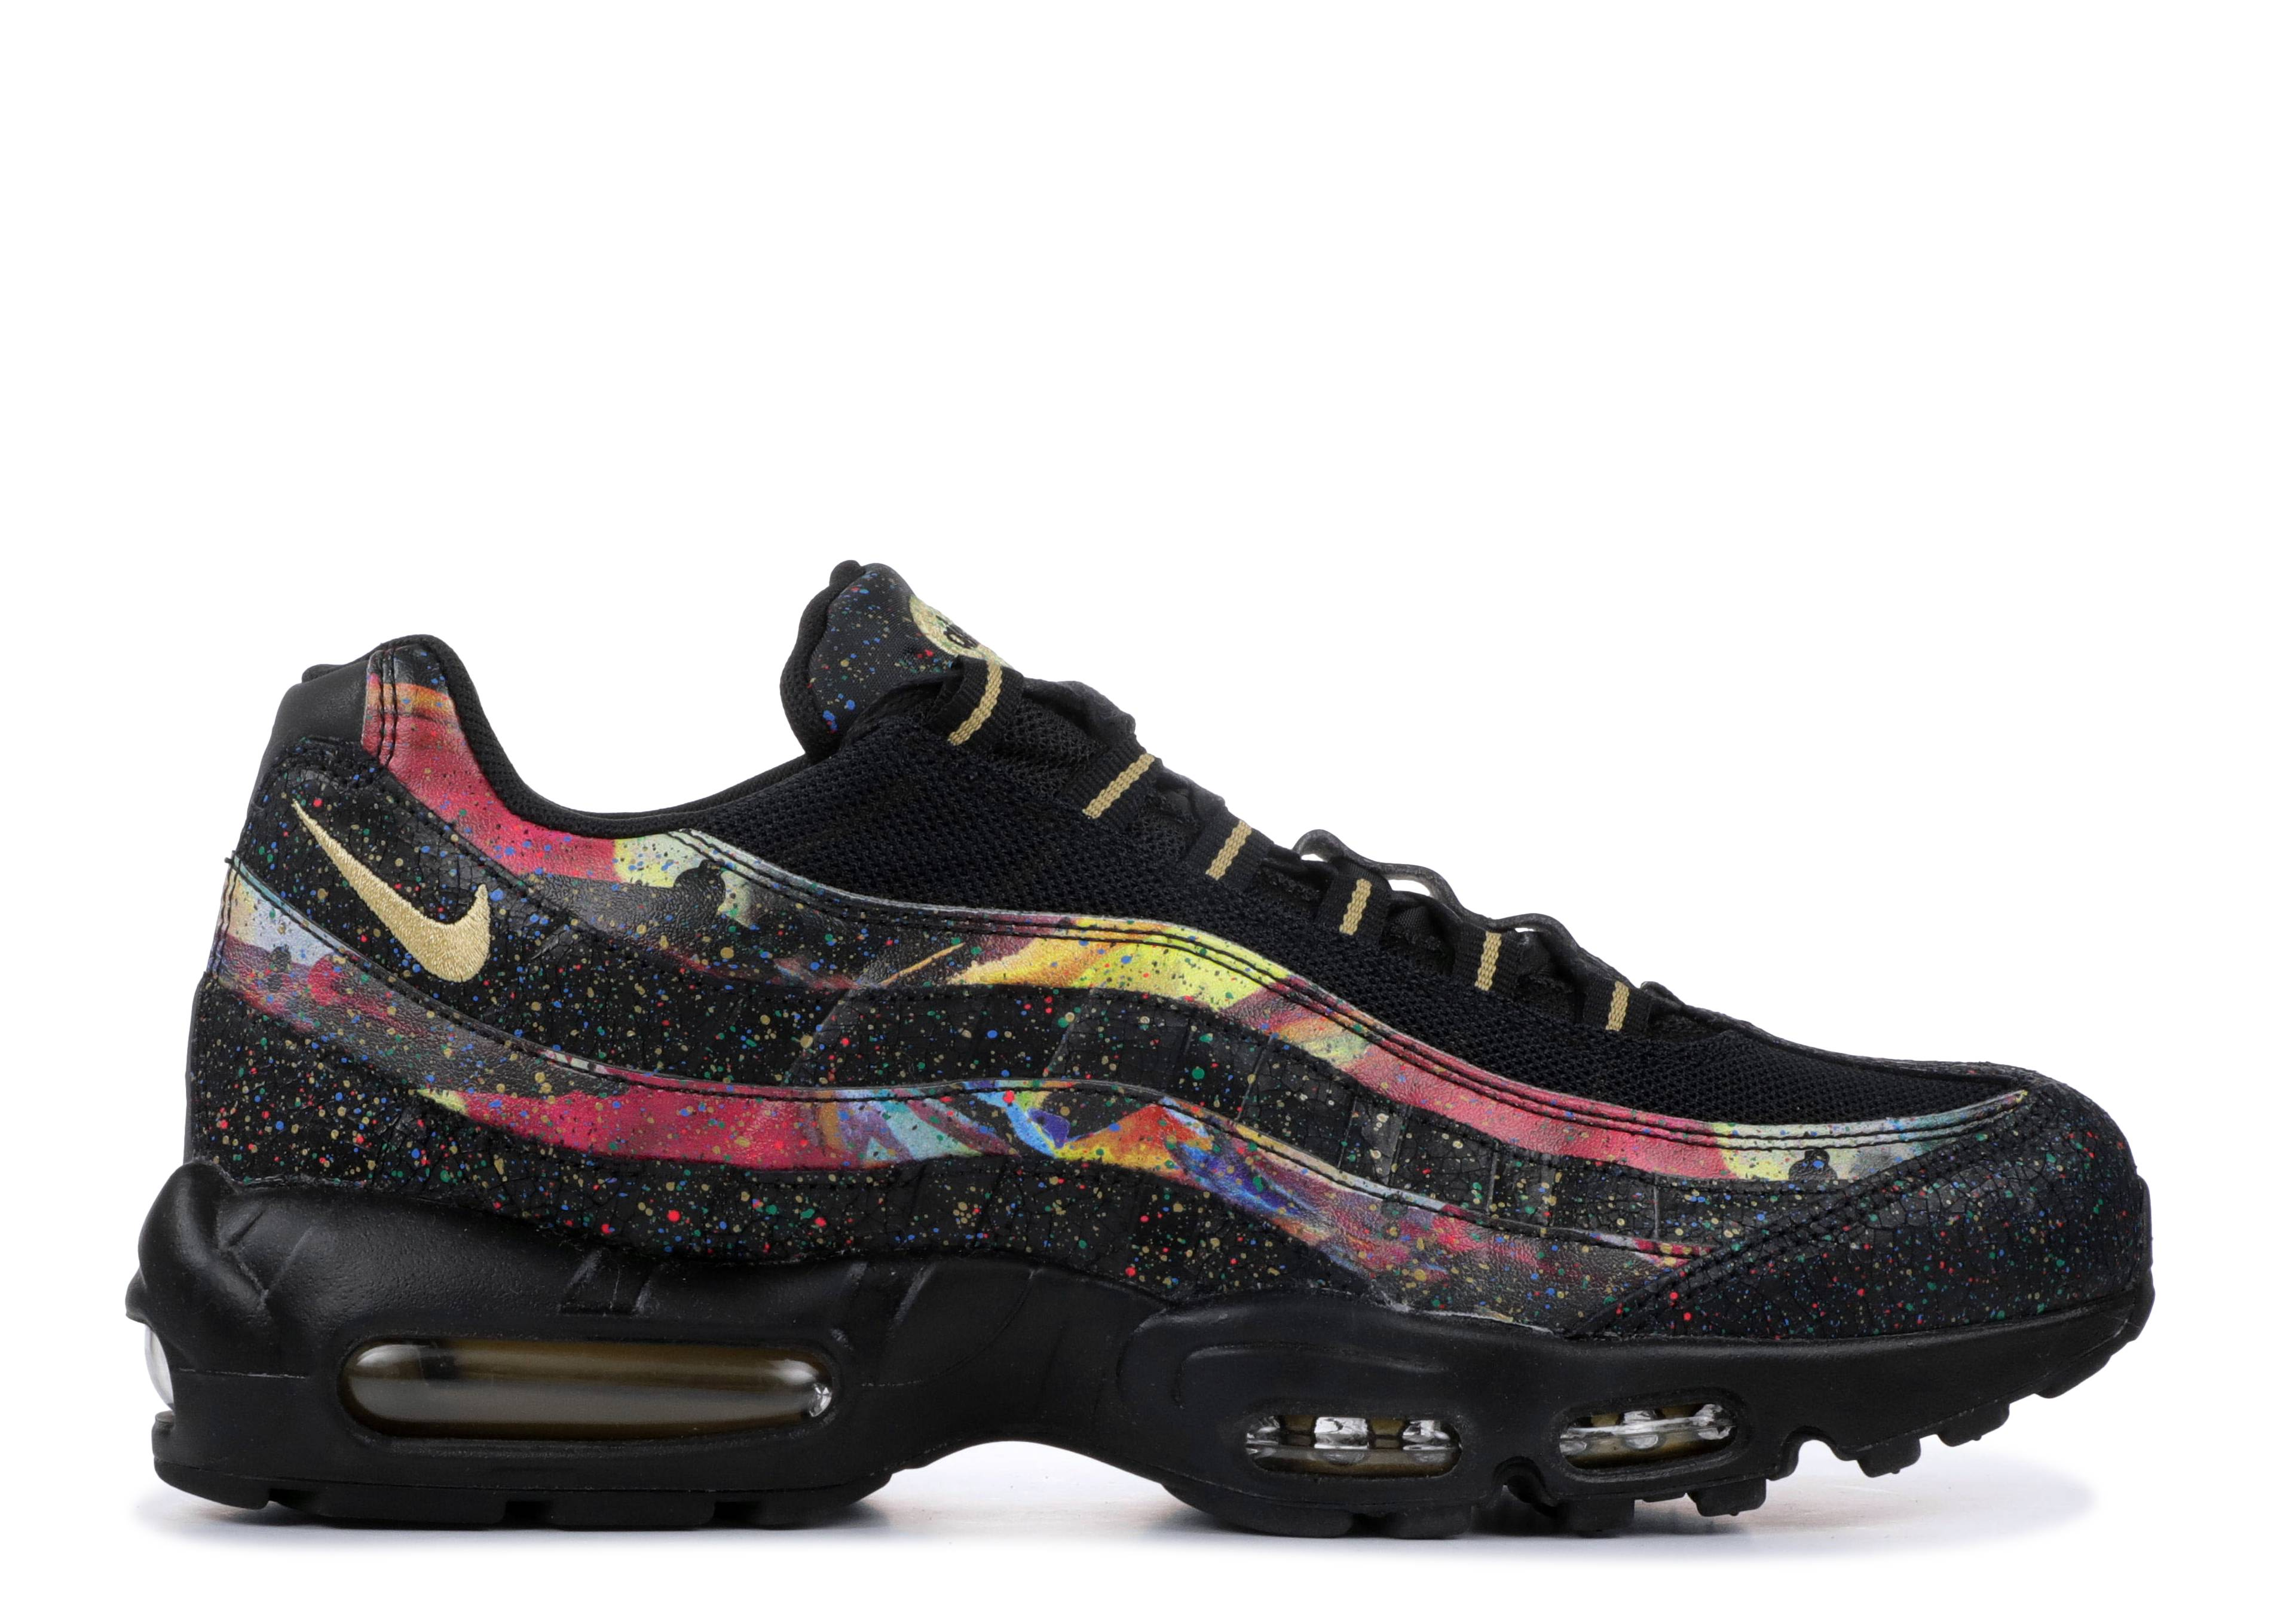 best sneakers 76024 5bbb0 Nike Air Max 95 - Nike - at6142 001 - black metallic gold   Flight Club